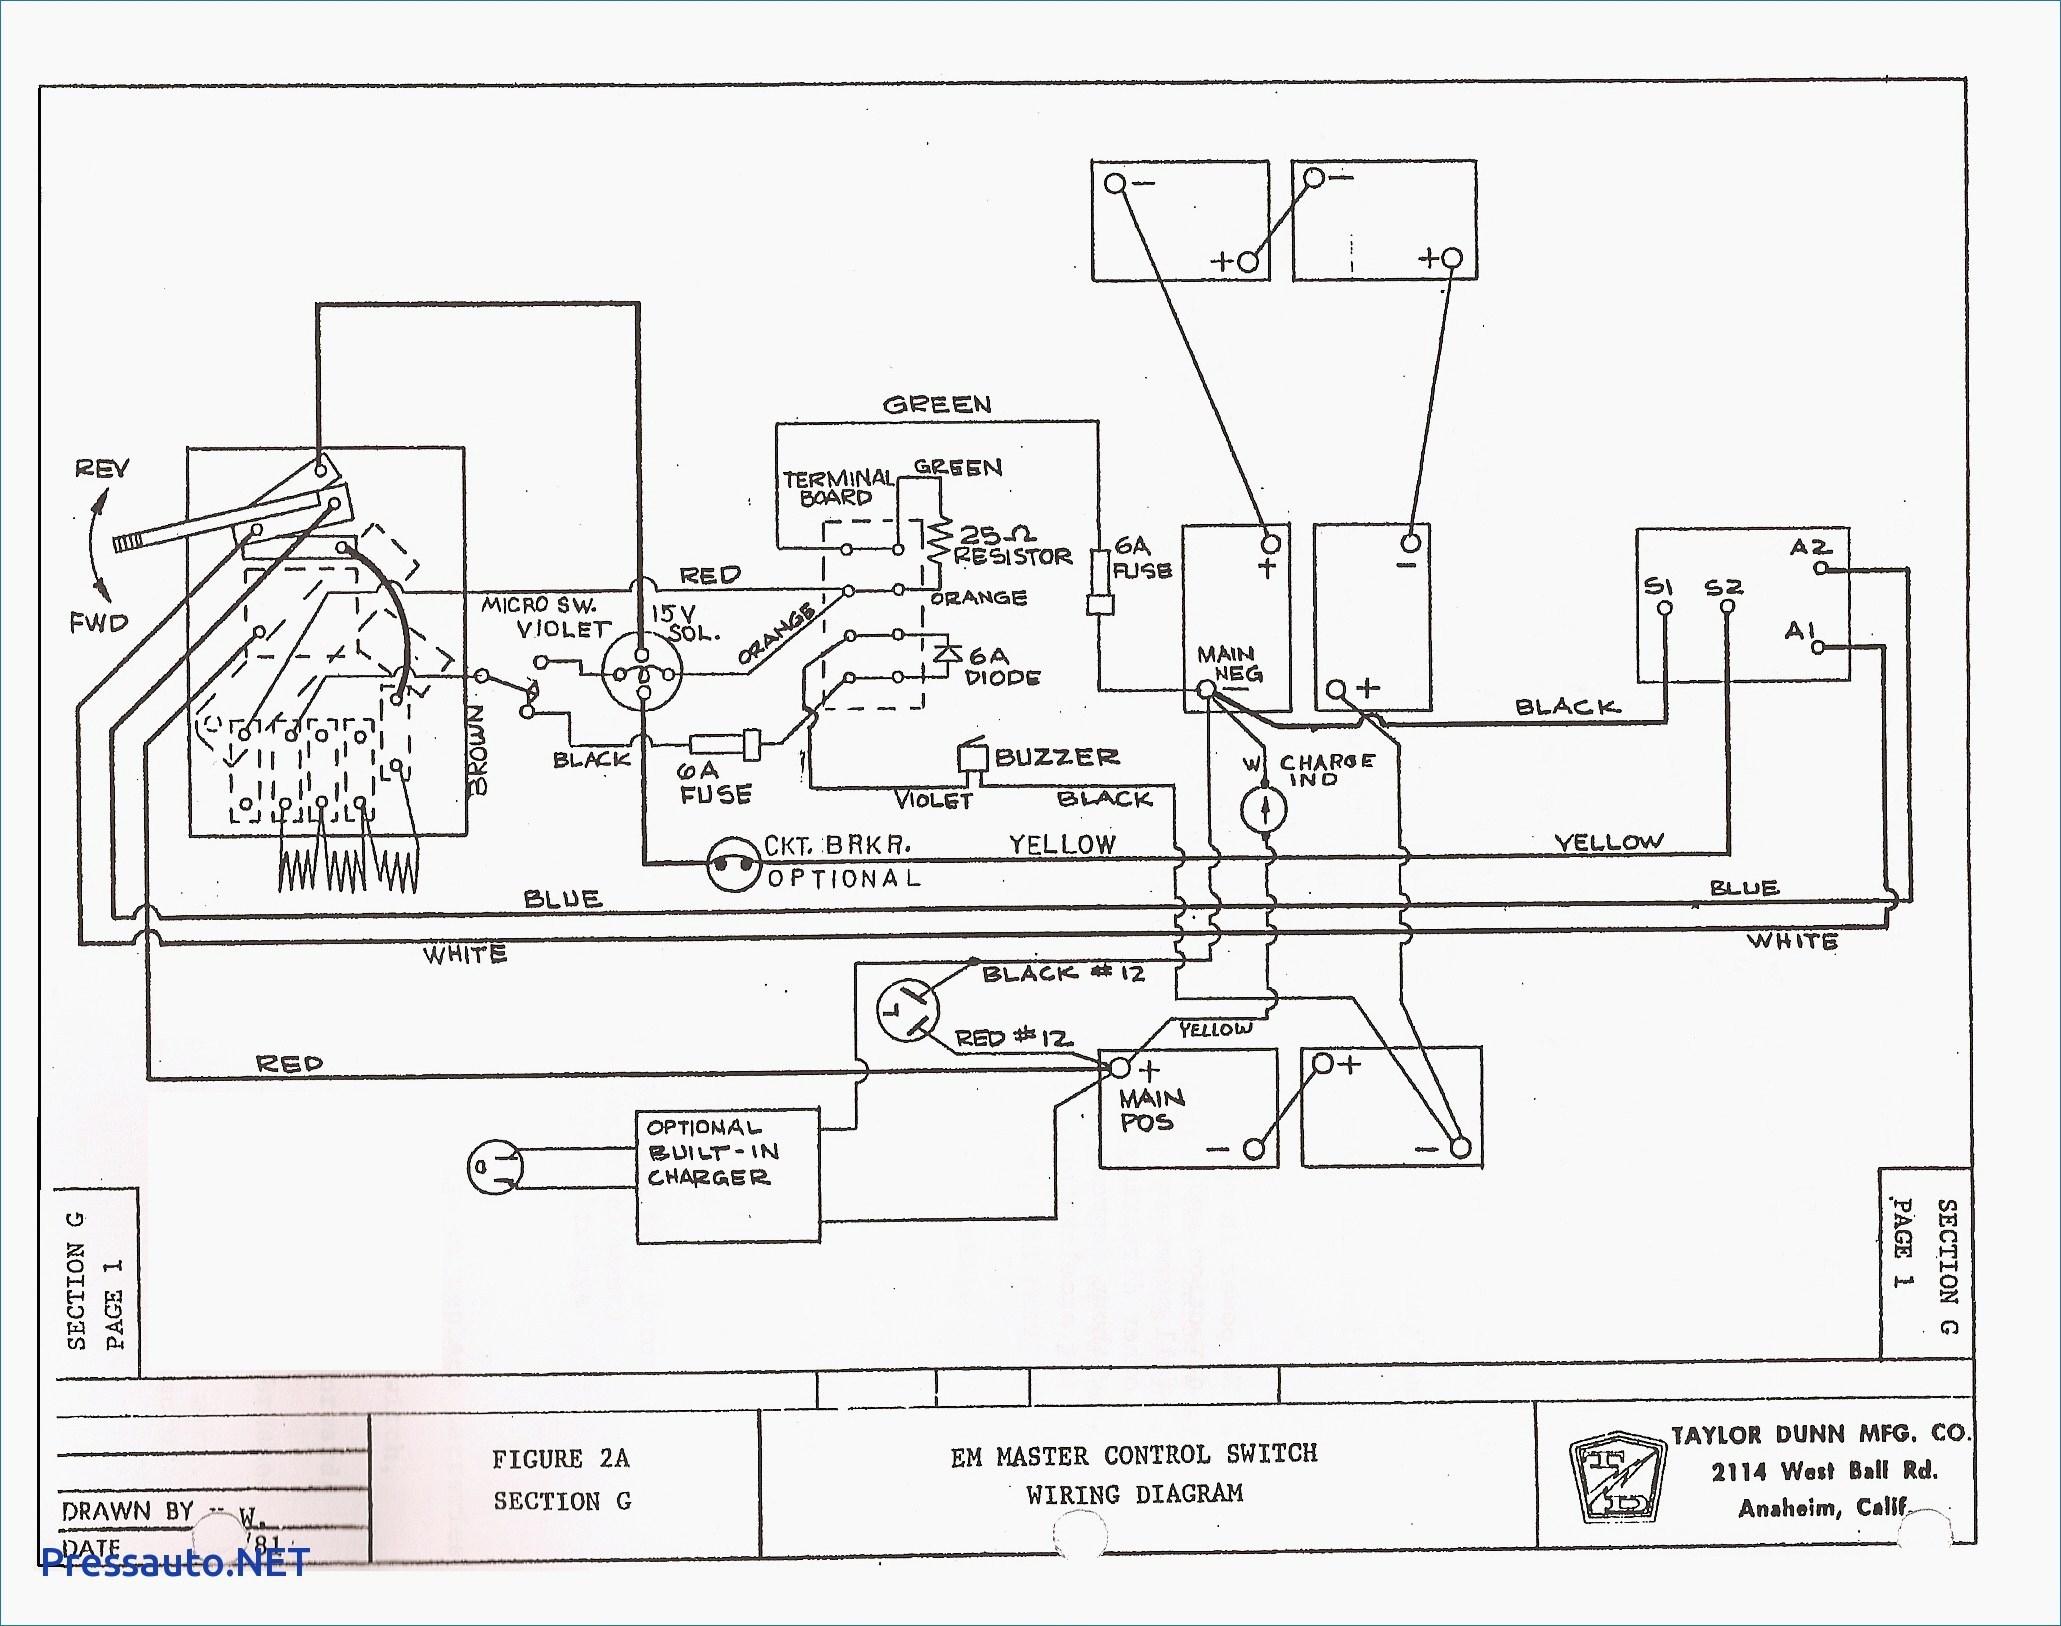 Yamaha G16 Golf Cart Wiring Diagram Electric   Wiring Diagram - Yamaha Golf Cart Wiring Diagram